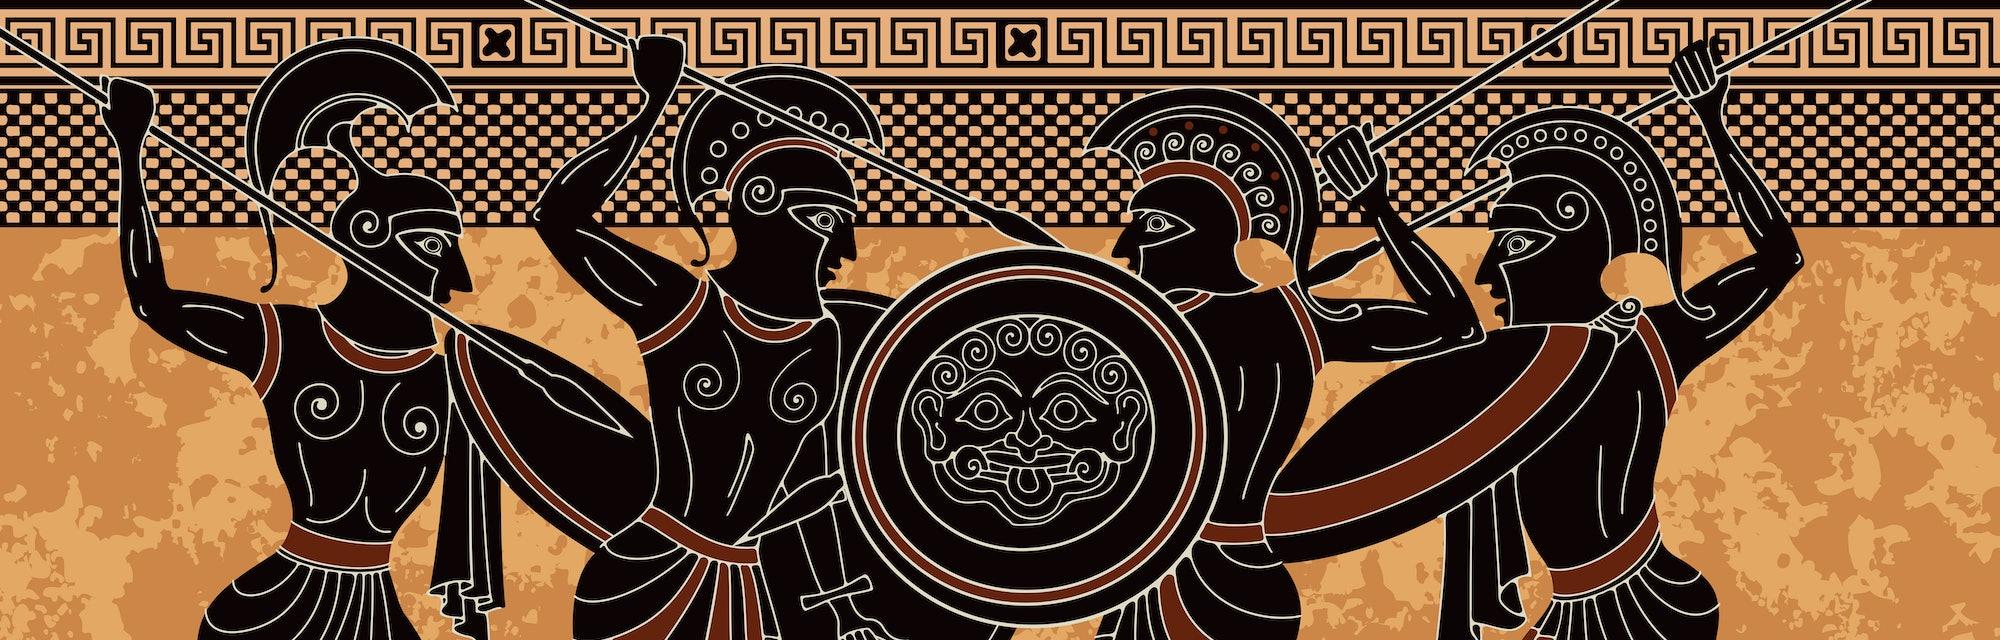 Ancient greece warrior.Black figure pottery.Ancient greek scene banner.Hero,spartan,myth.Ancient civilization culture.